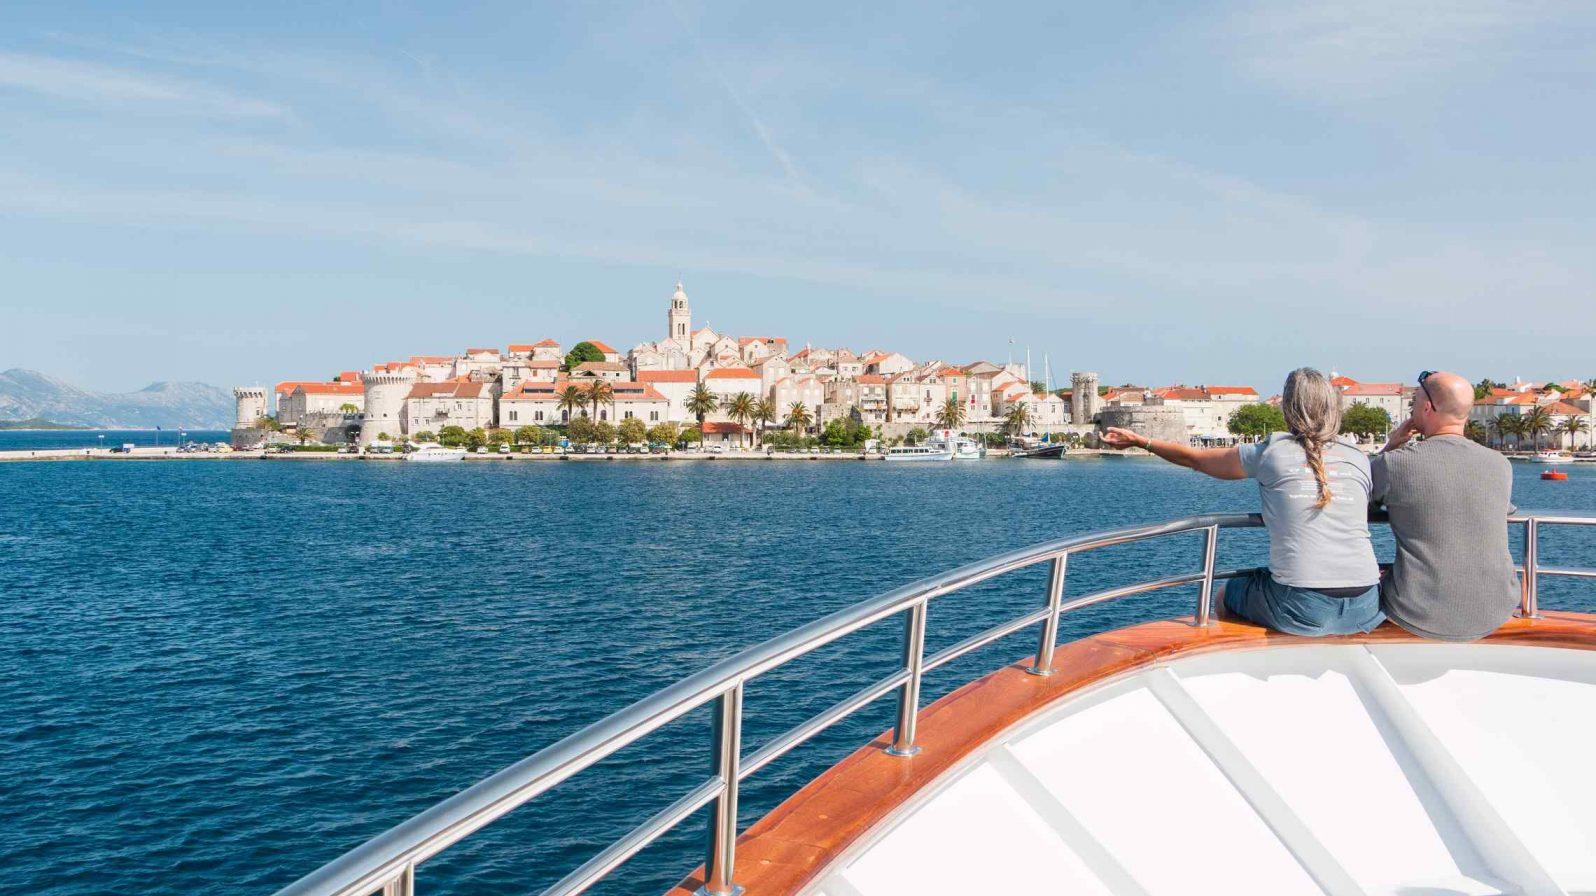 Korcula-Kroatia-®-Katarina-Line-1596x896.jpg